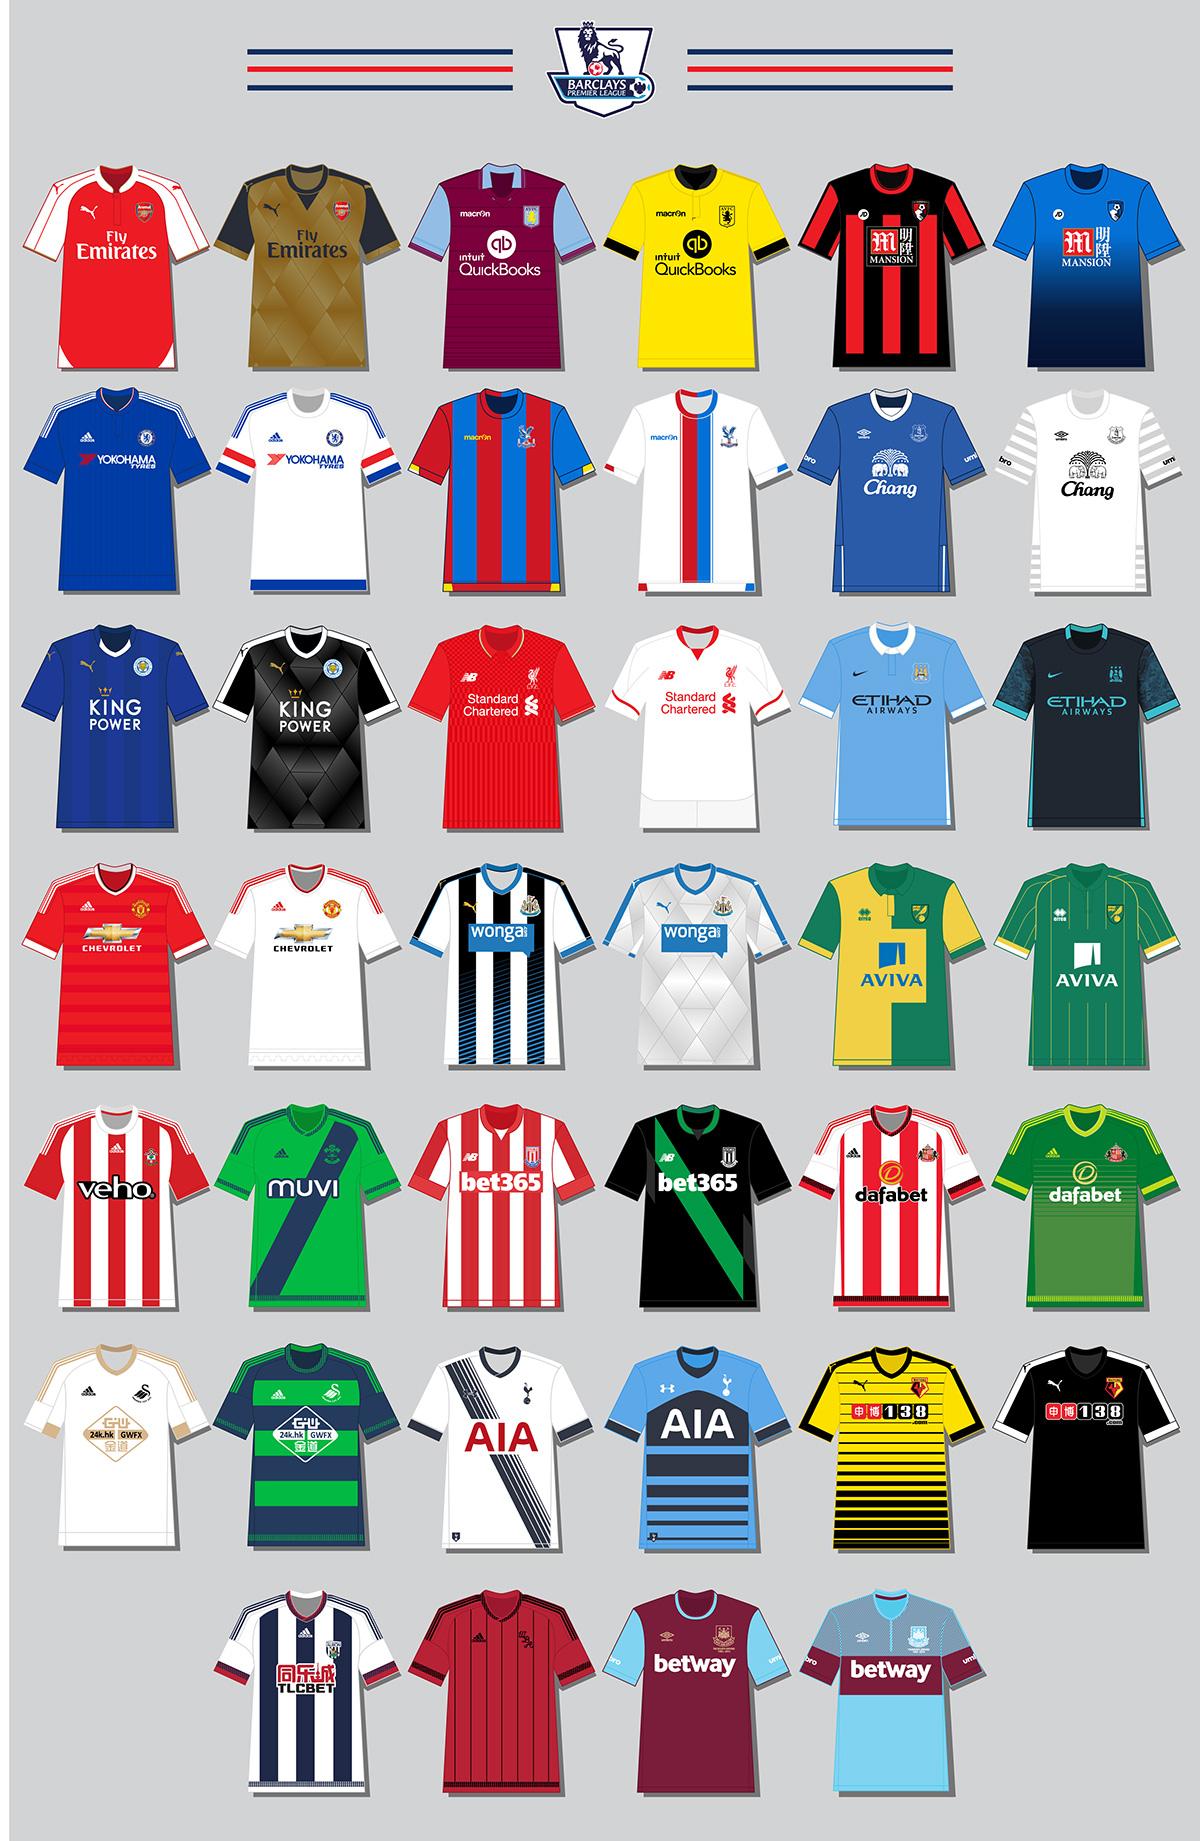 buy online 0957f e3115 2015/16 Premier League Team Kits on Behance